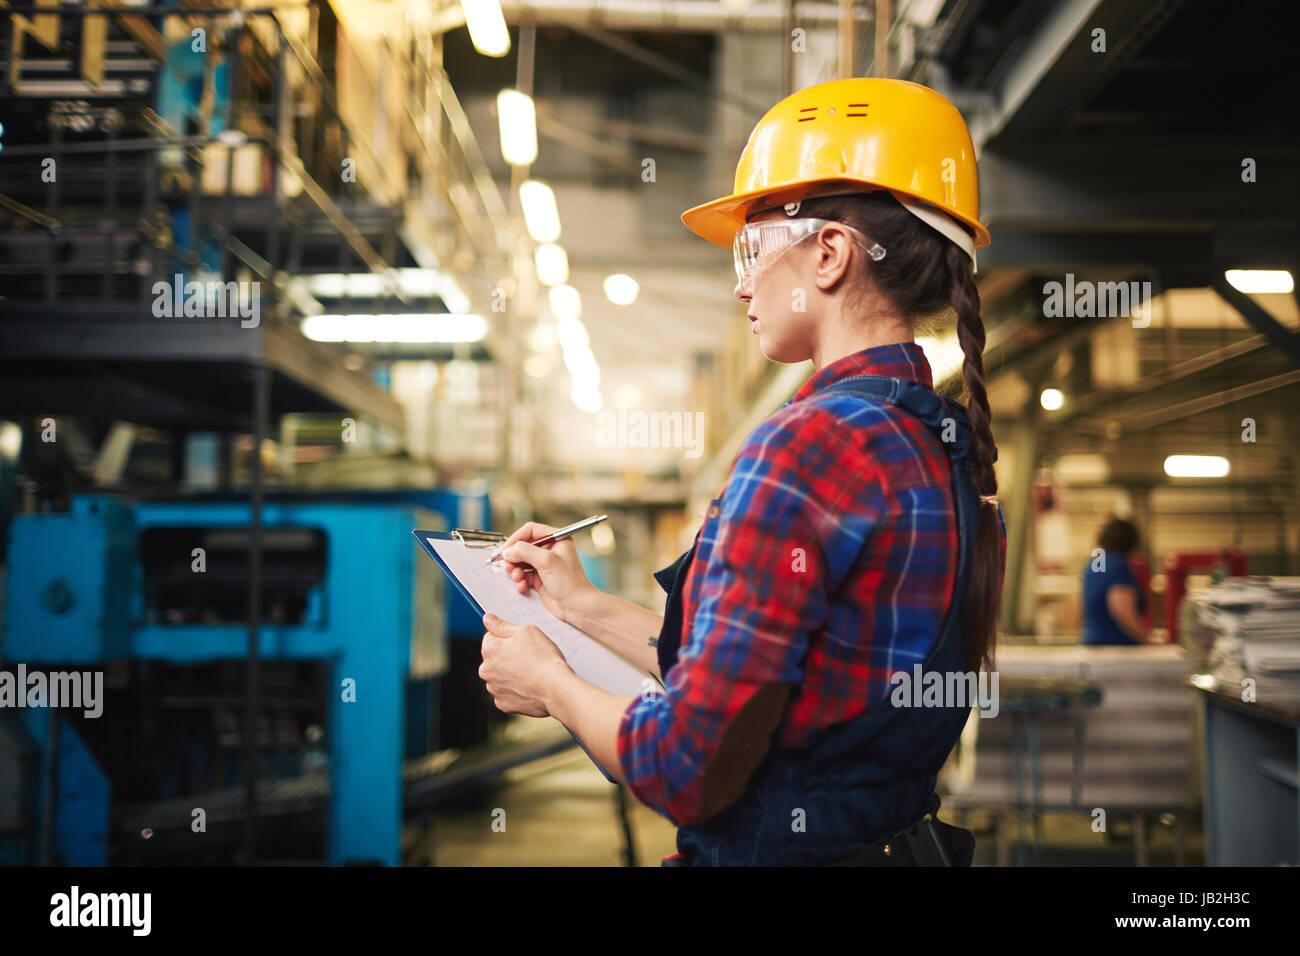 Examining Equipment in Plant - Stock Image